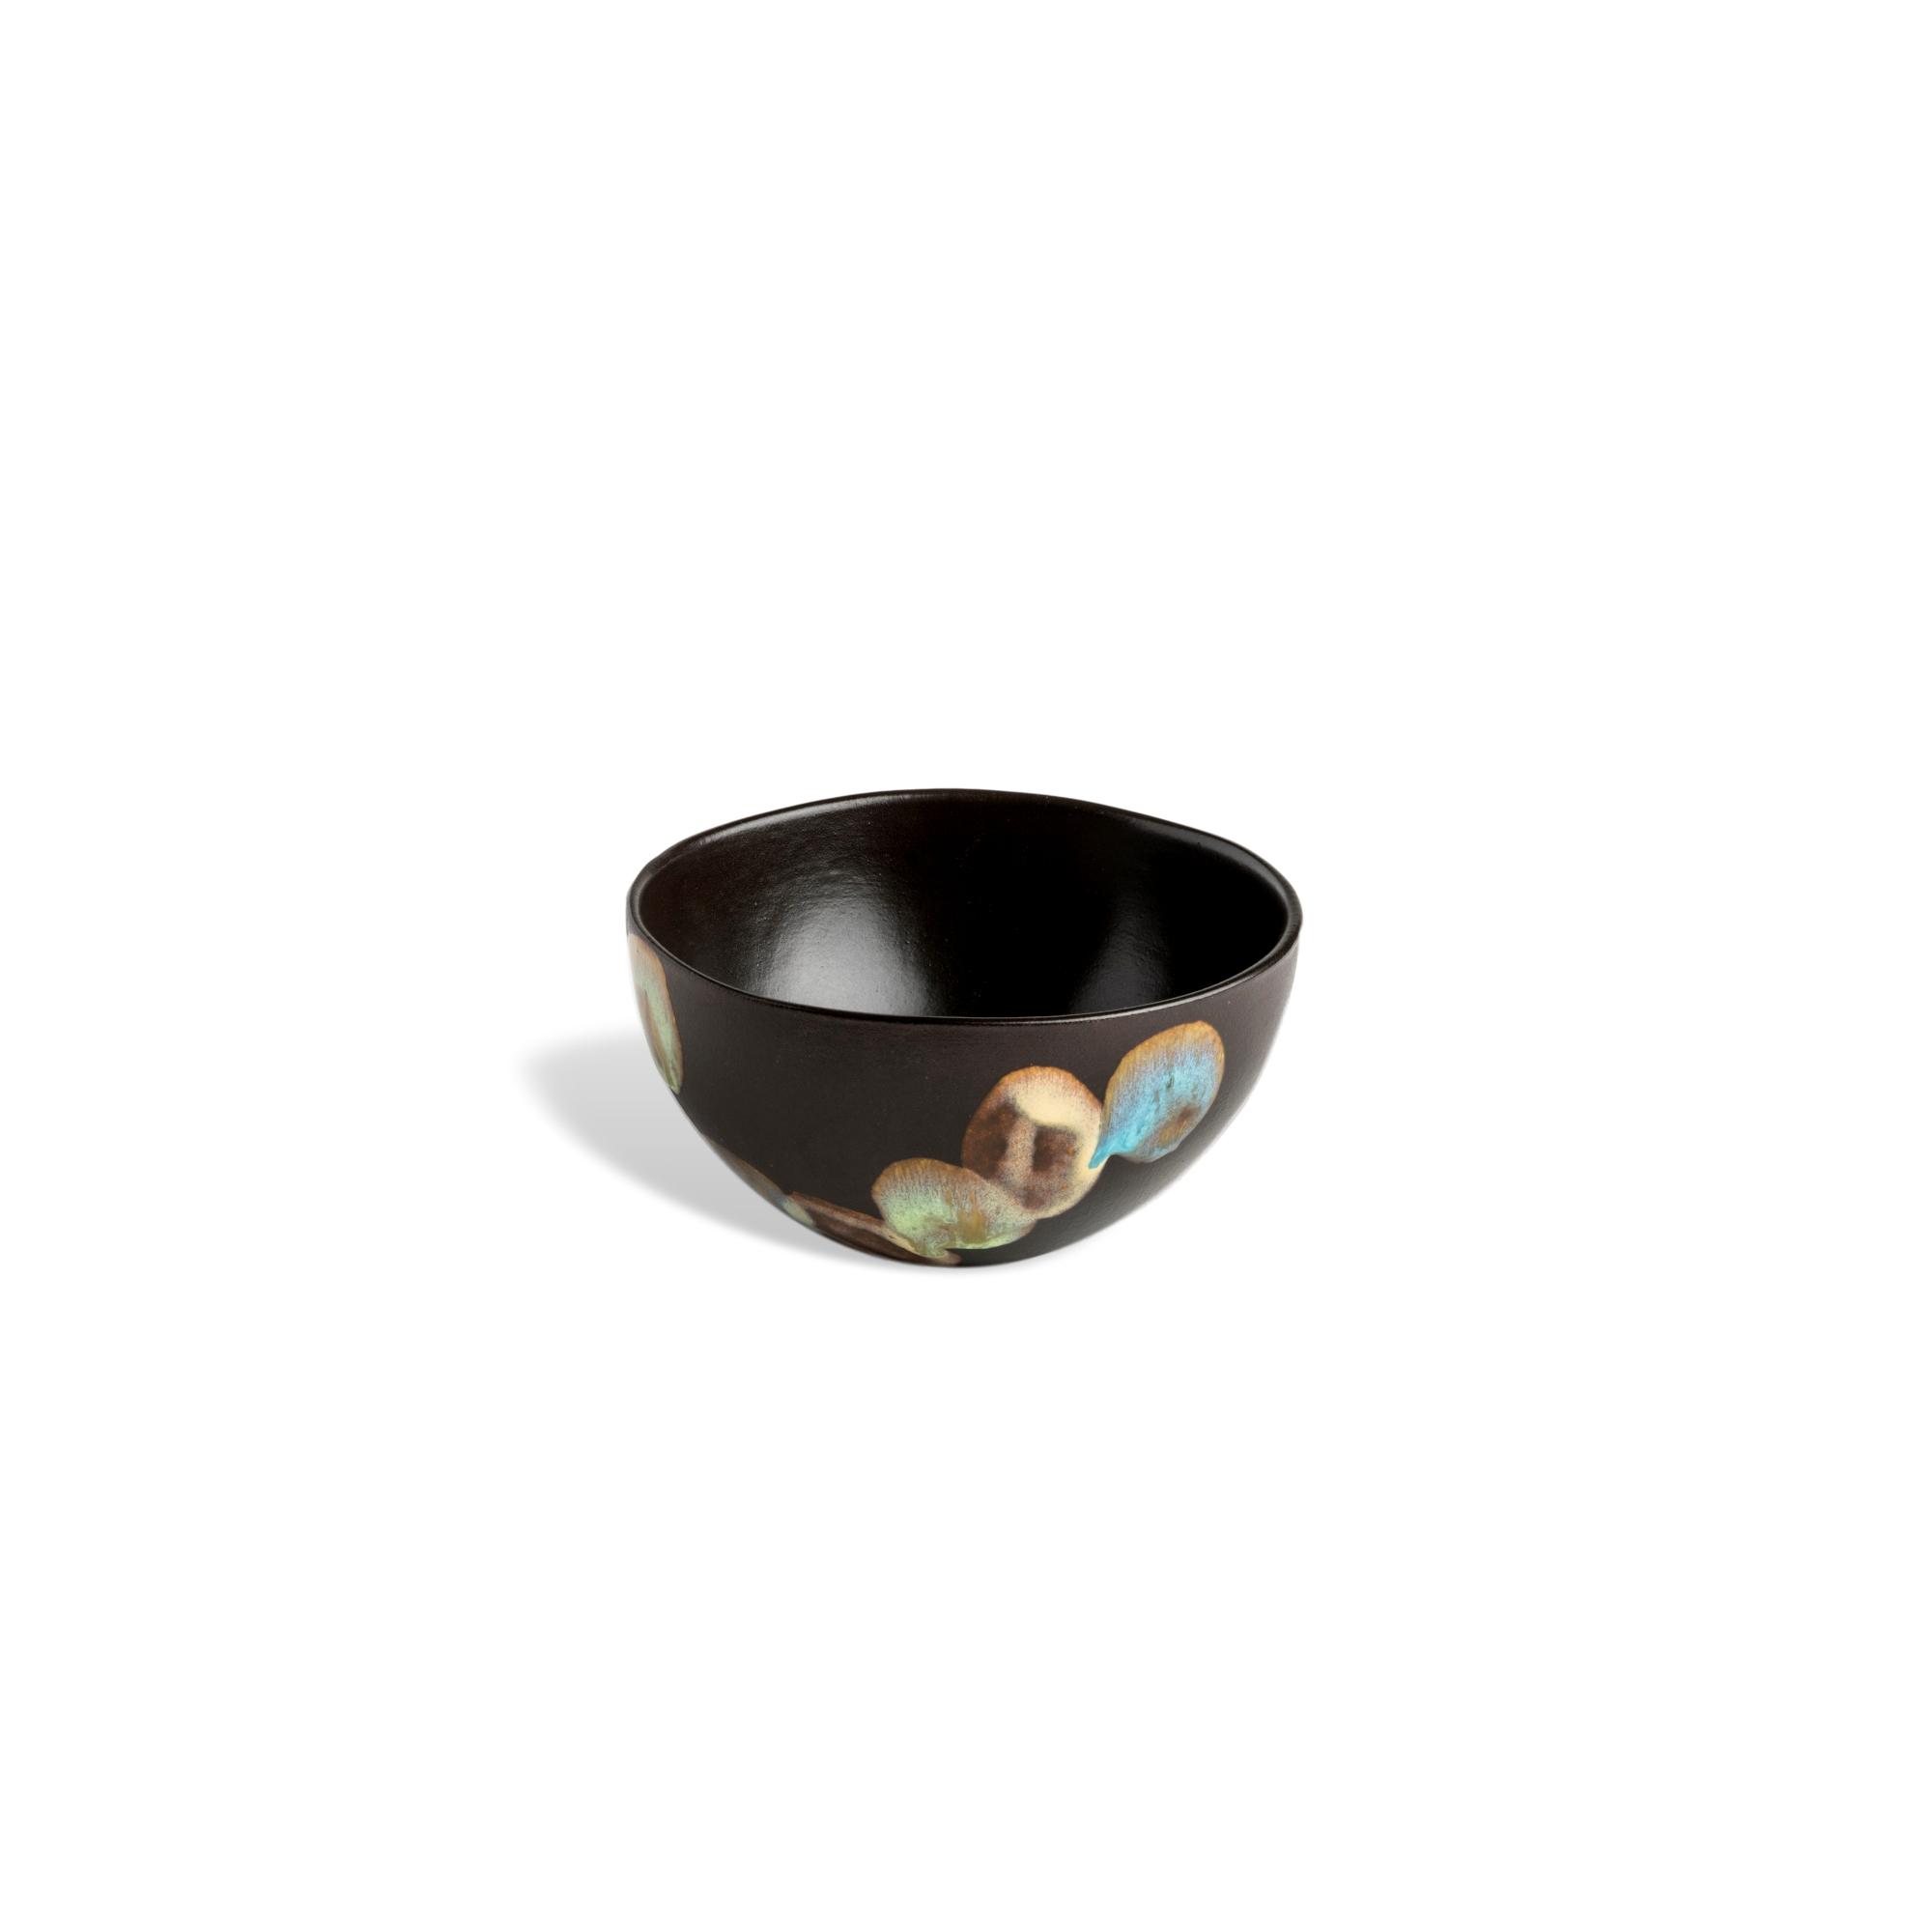 Carmel Ceramica Dappled 5 Inch Dip Bowl